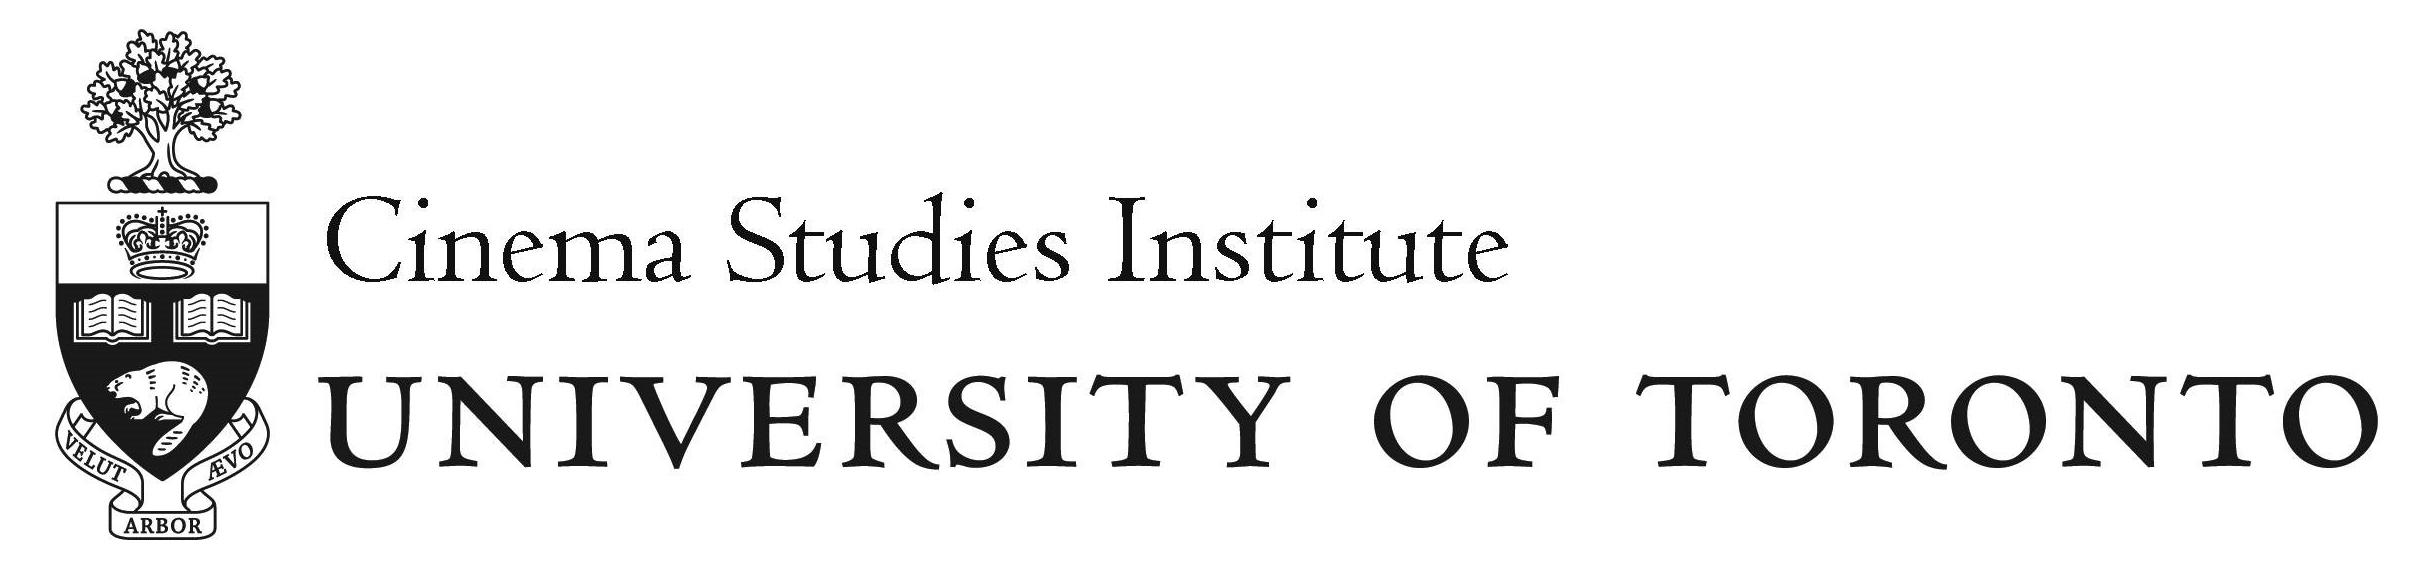 University of Toronto Cinema Studies Institute